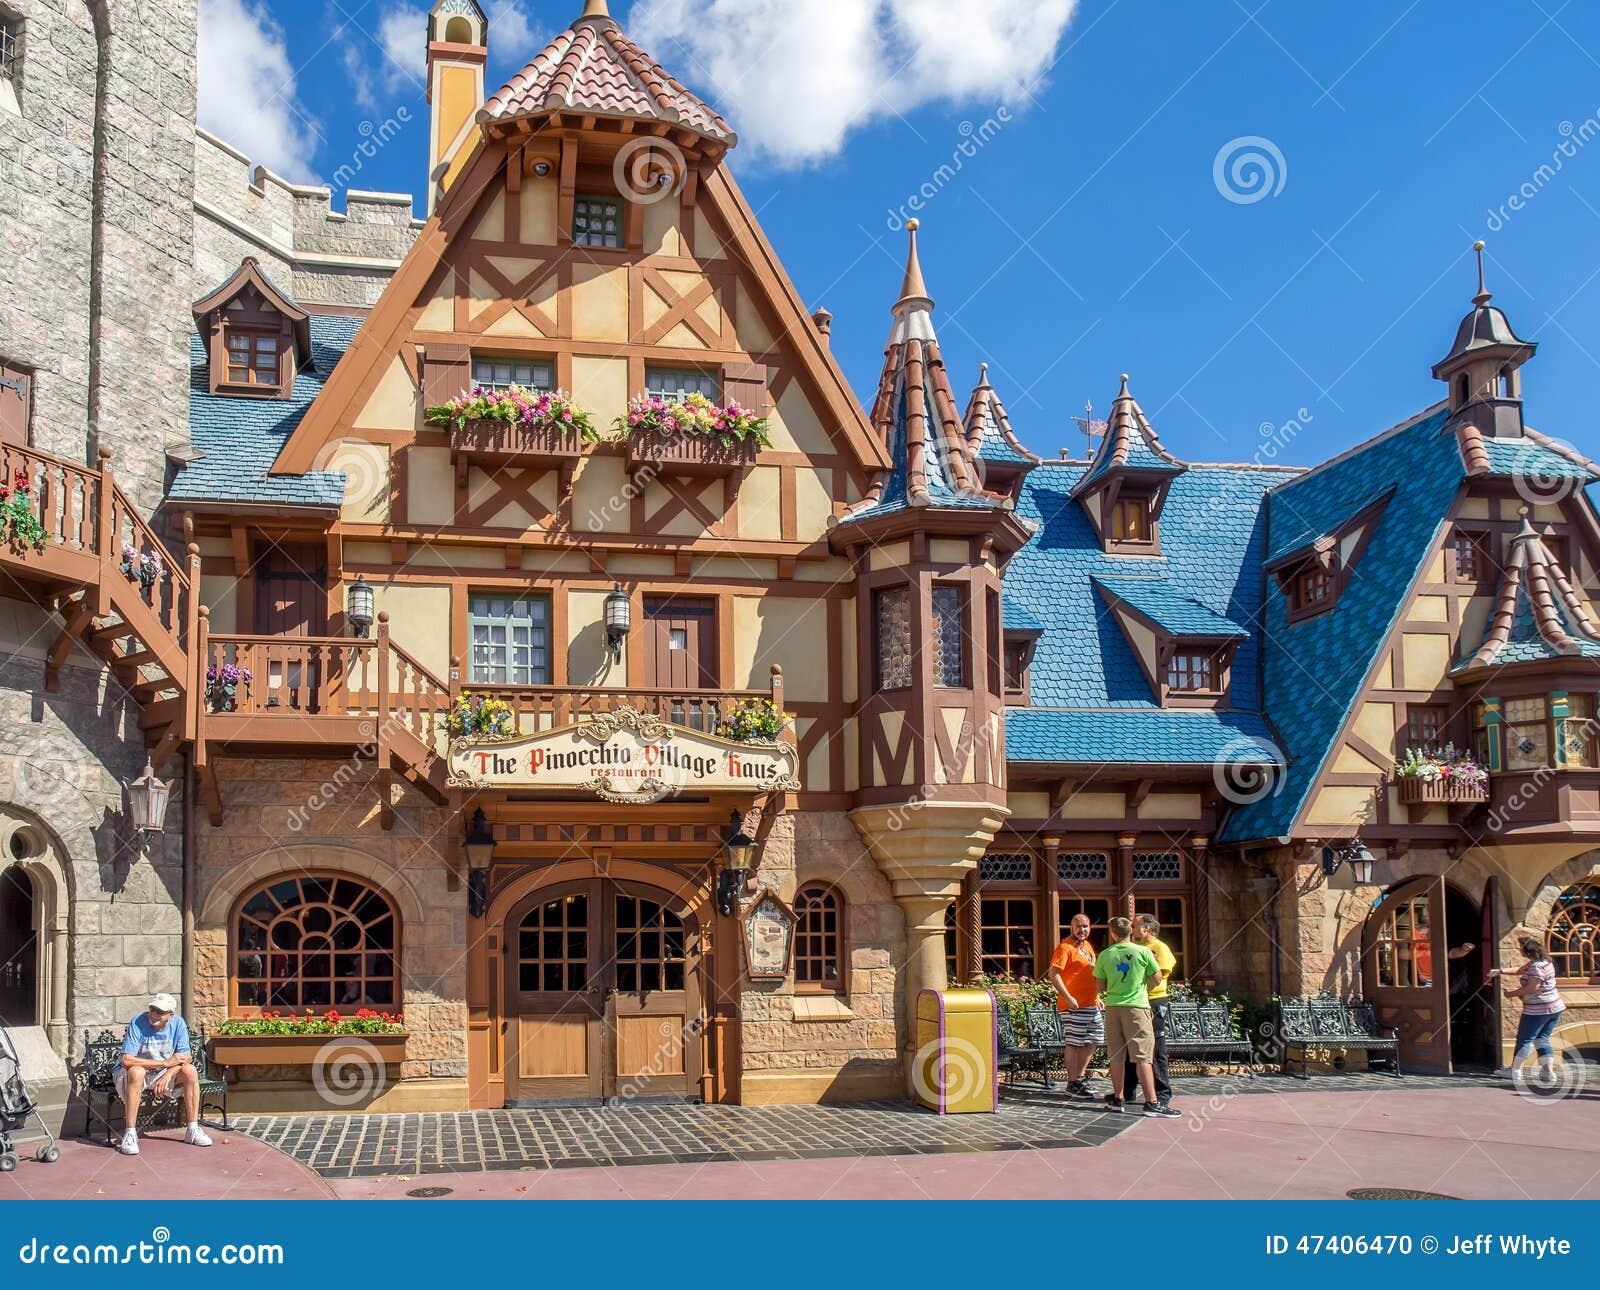 Fantasyland Disney World Editorial Image Image 47406470